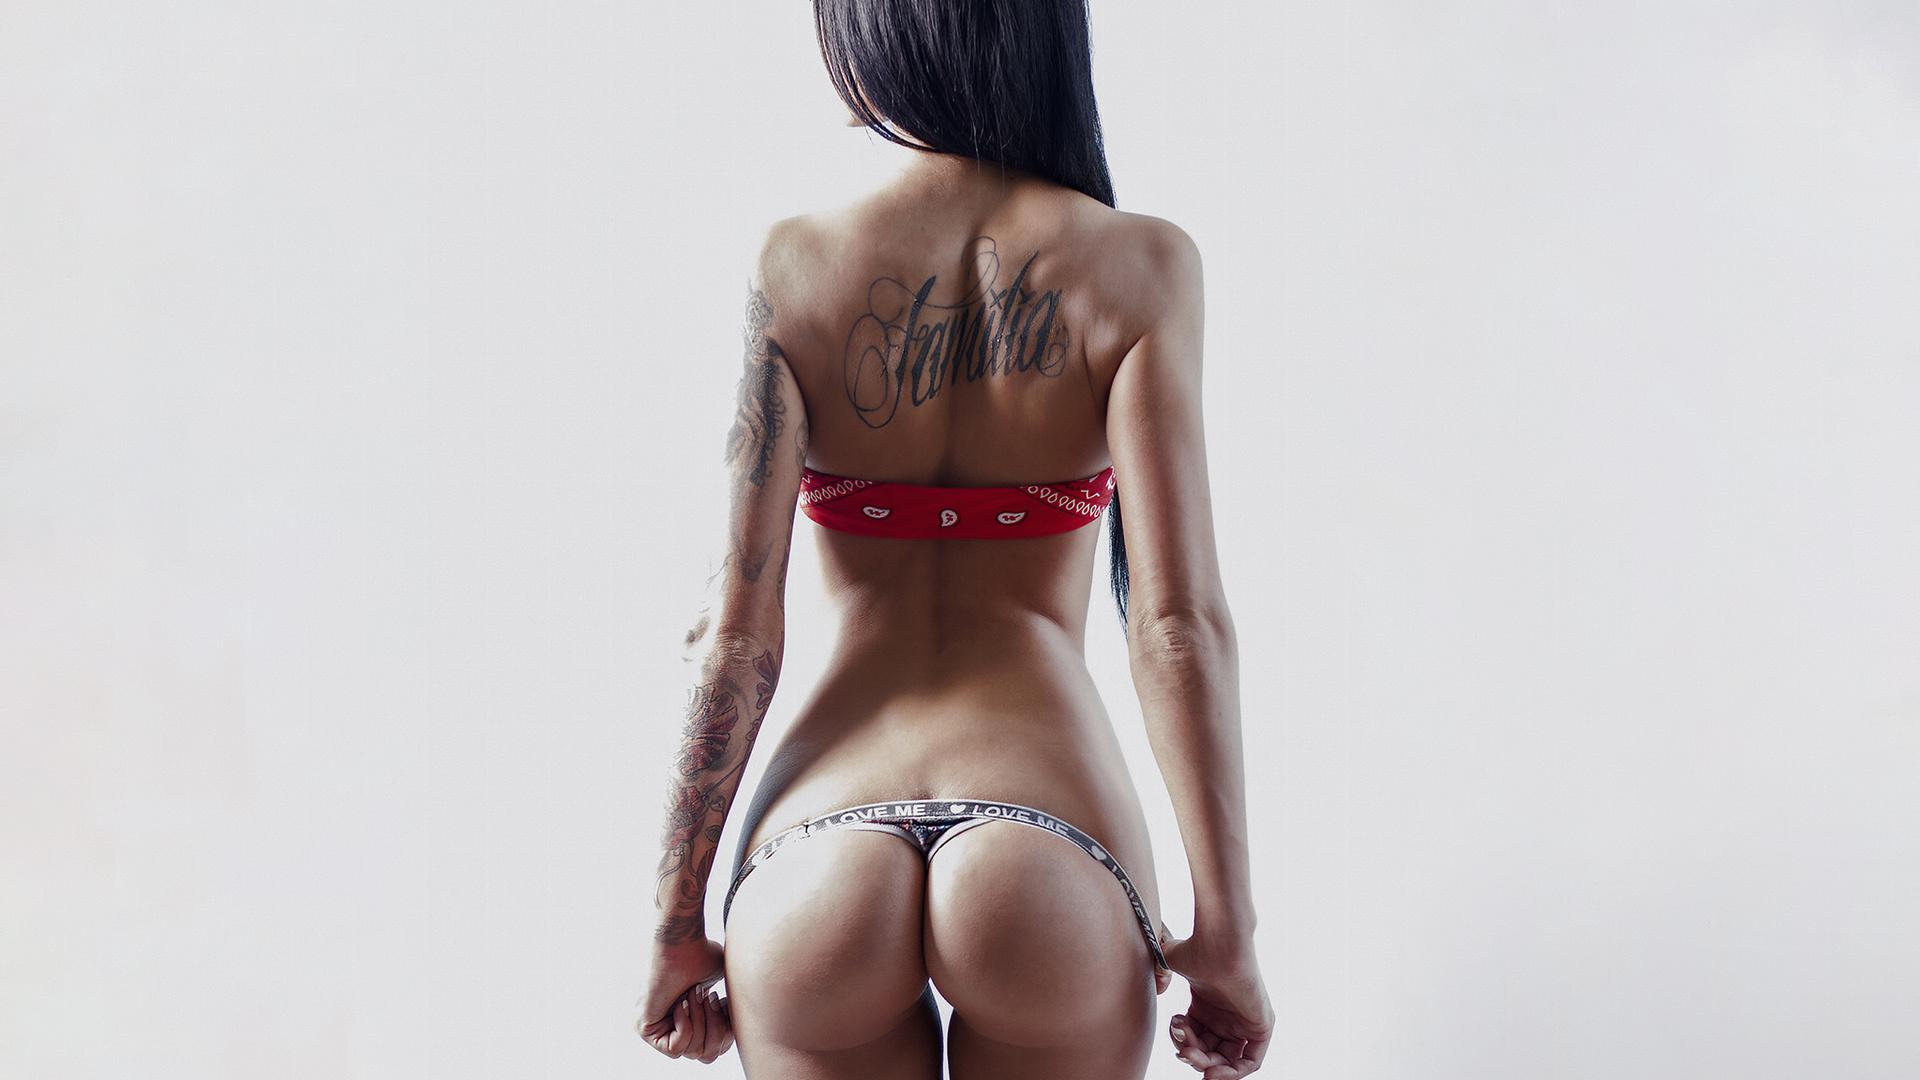 smotret-pikap-porno-v-magazine